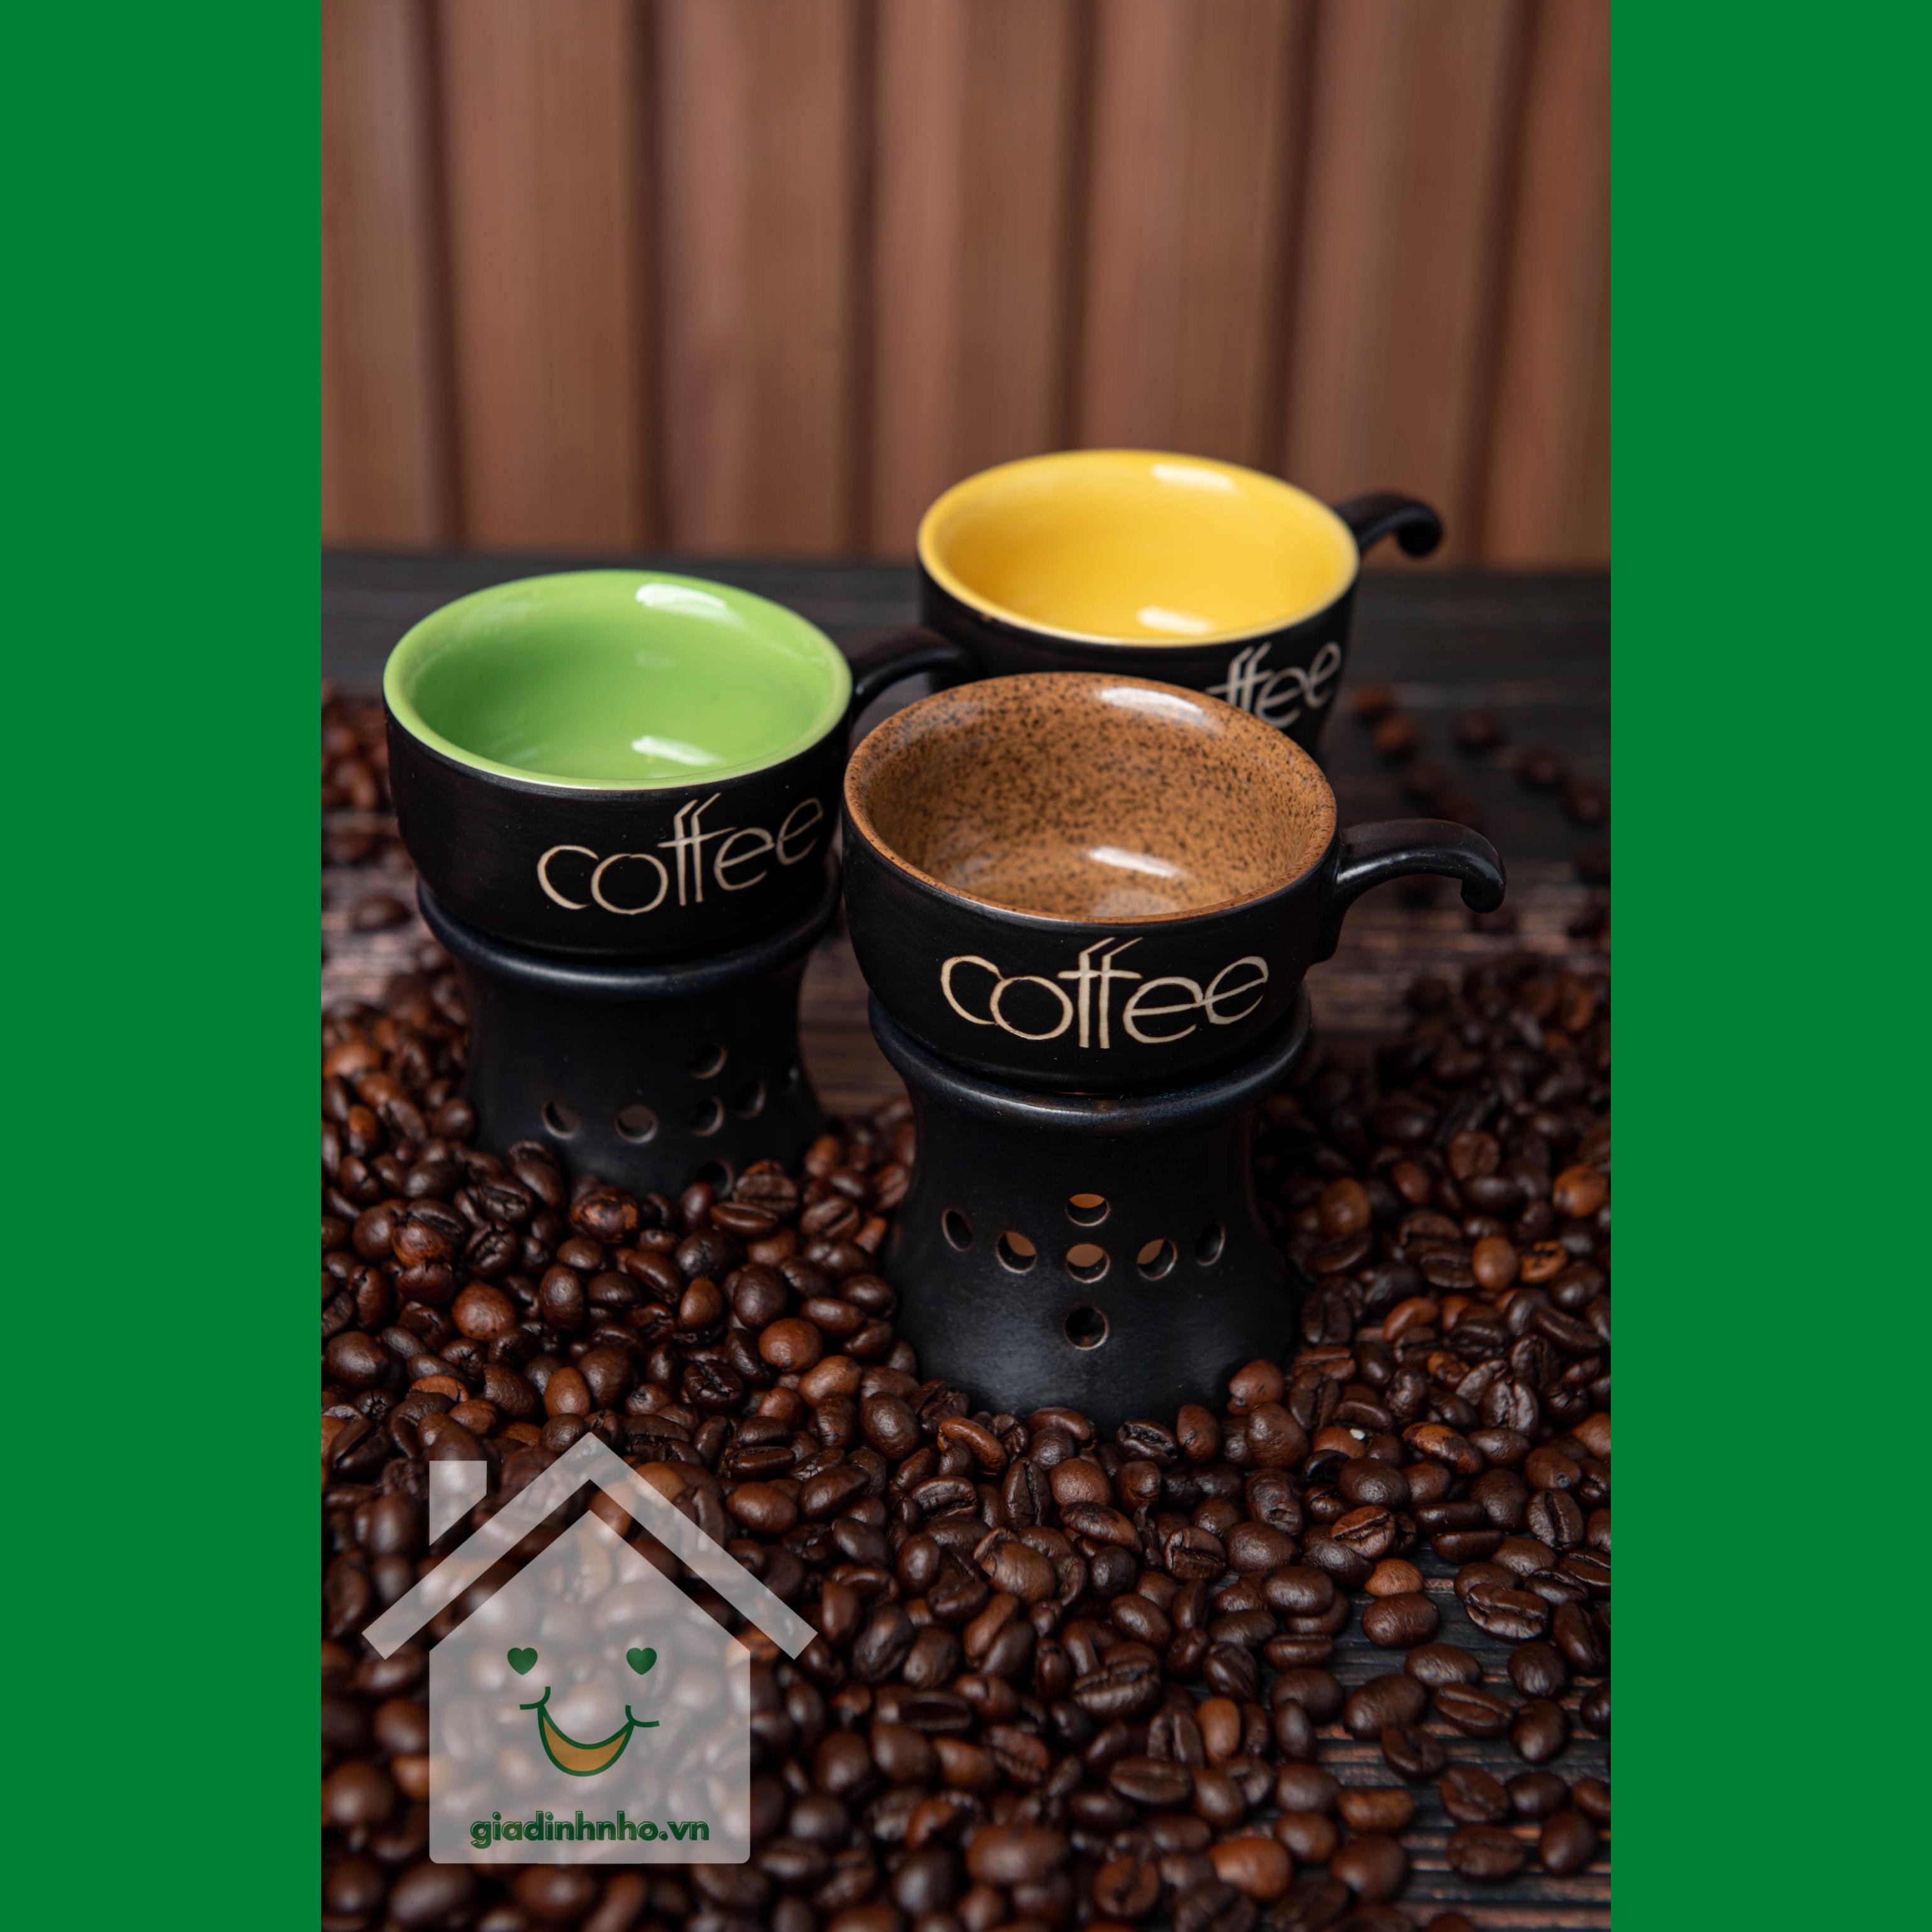 Bộ Cốc Cafe - Bếp Thấp